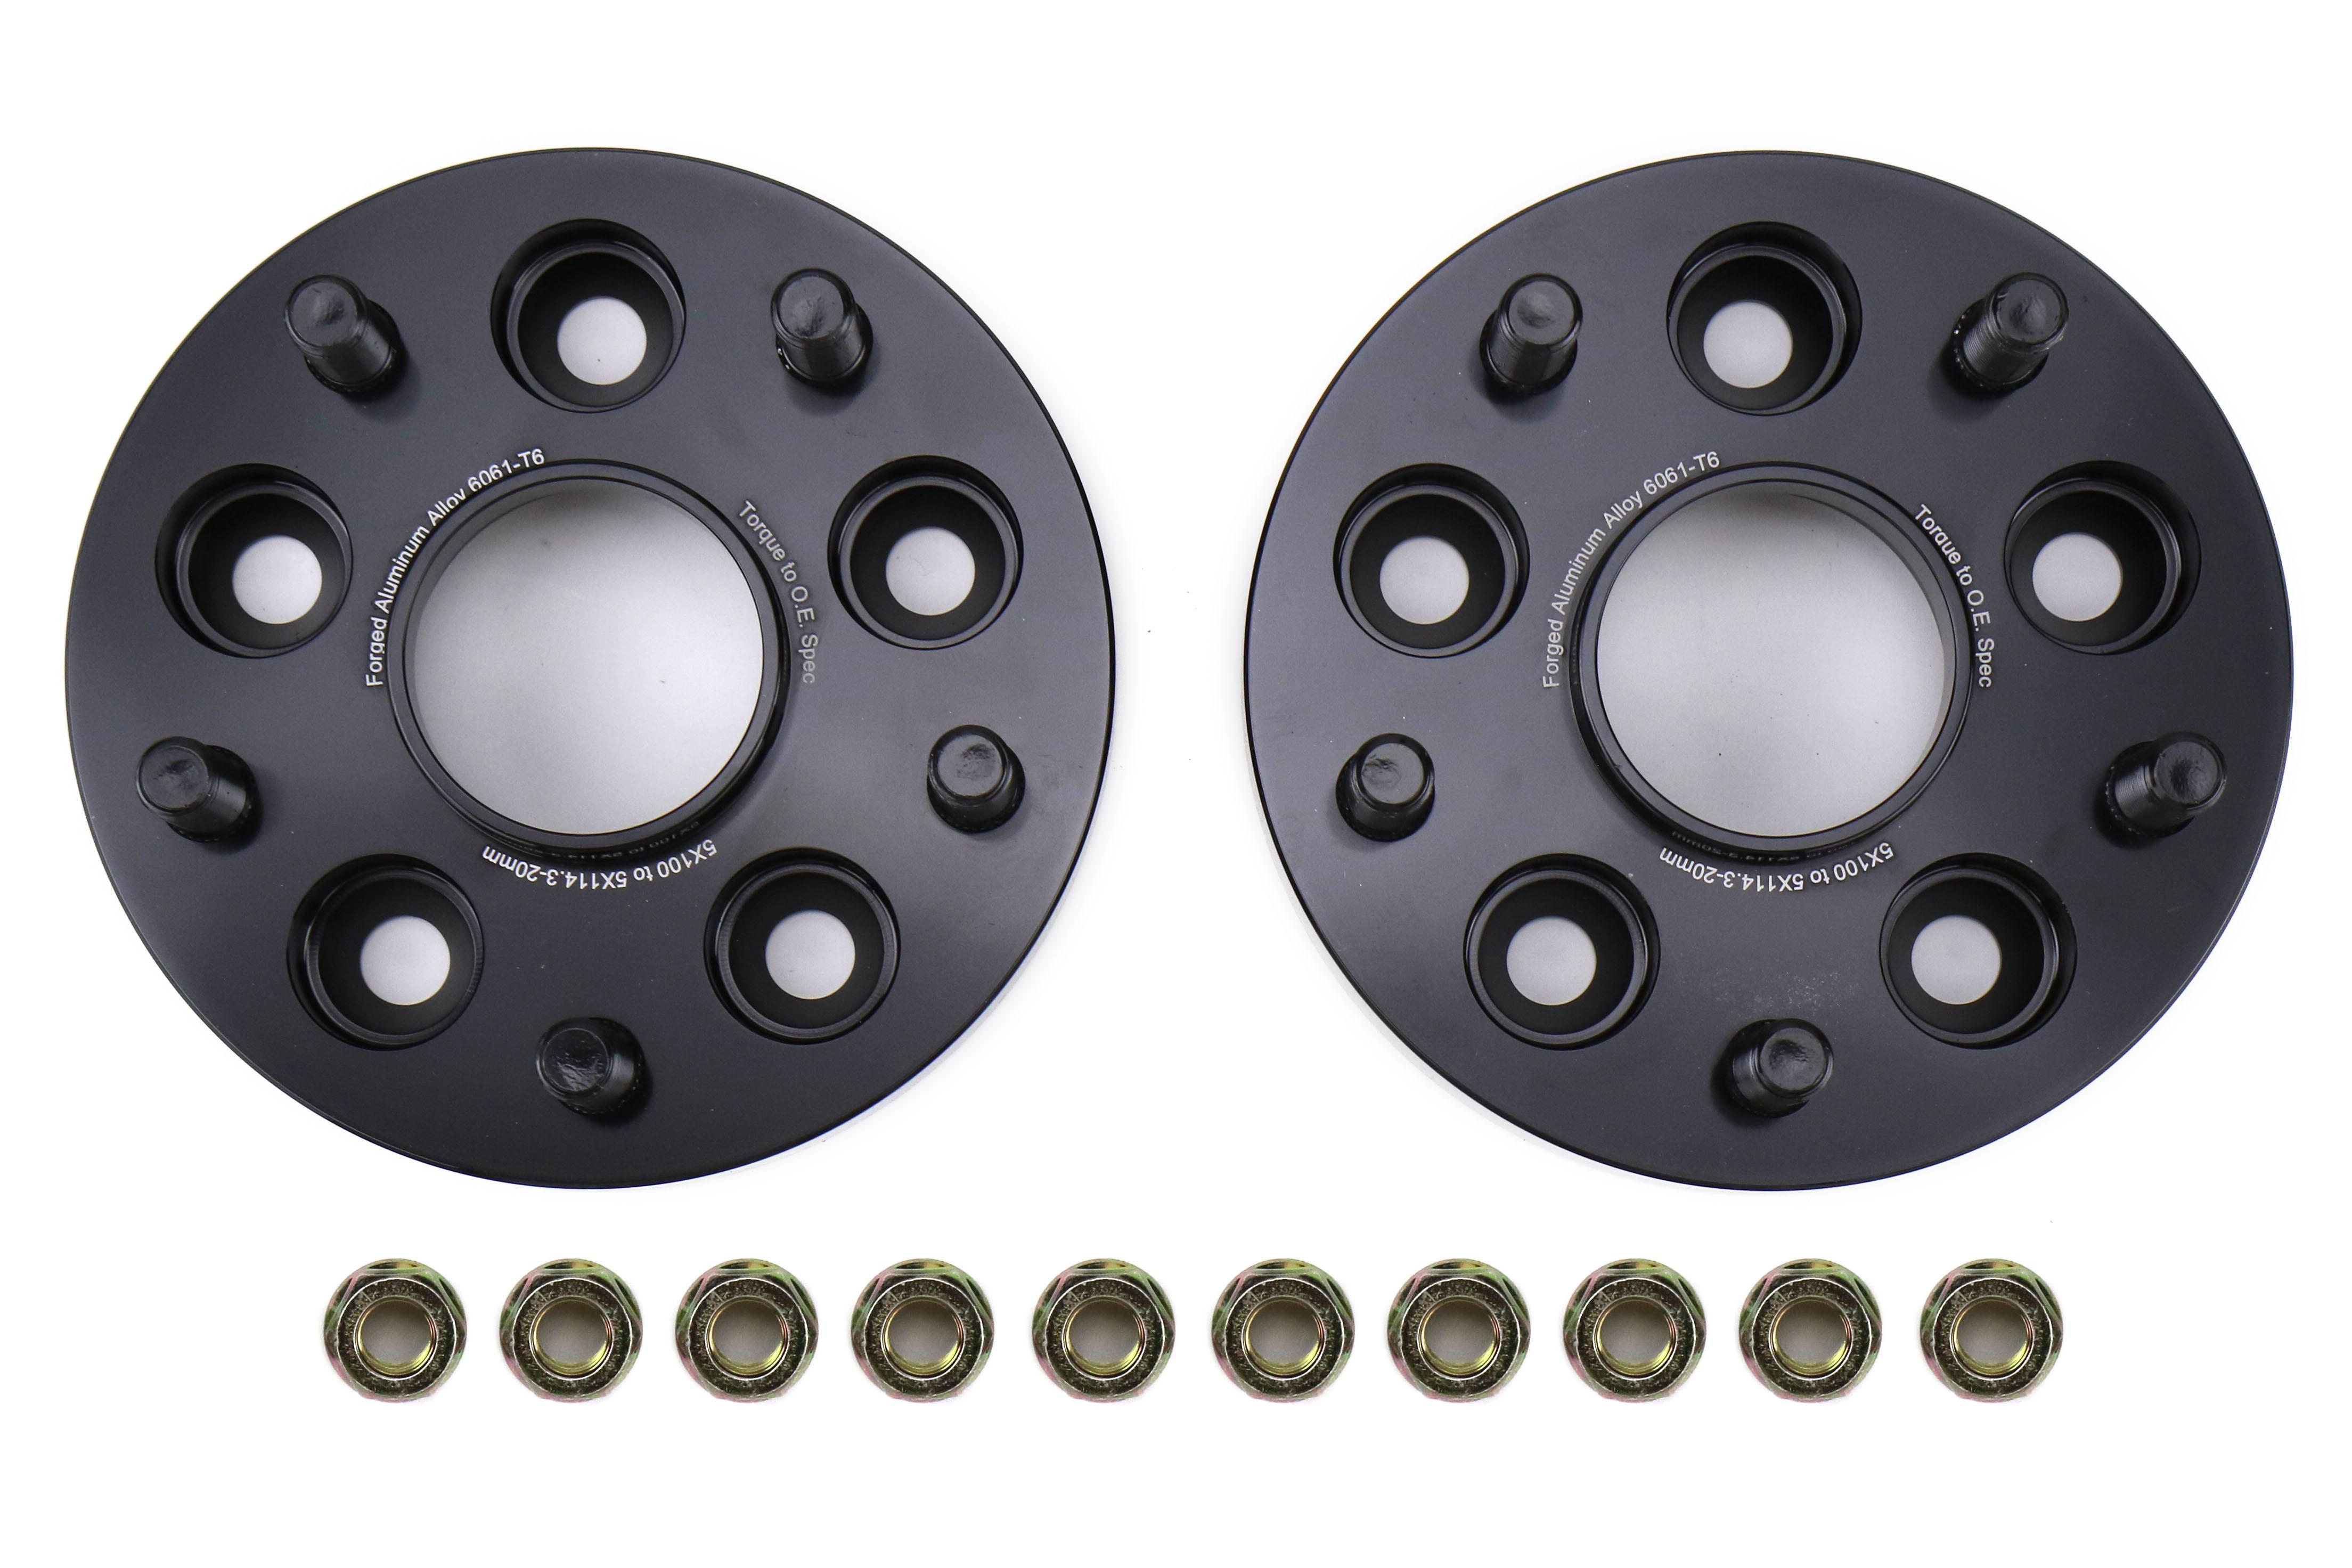 FactionFab Subaru 5X100 to 5X114.3 20mm Wheel Spacer Conversion Set